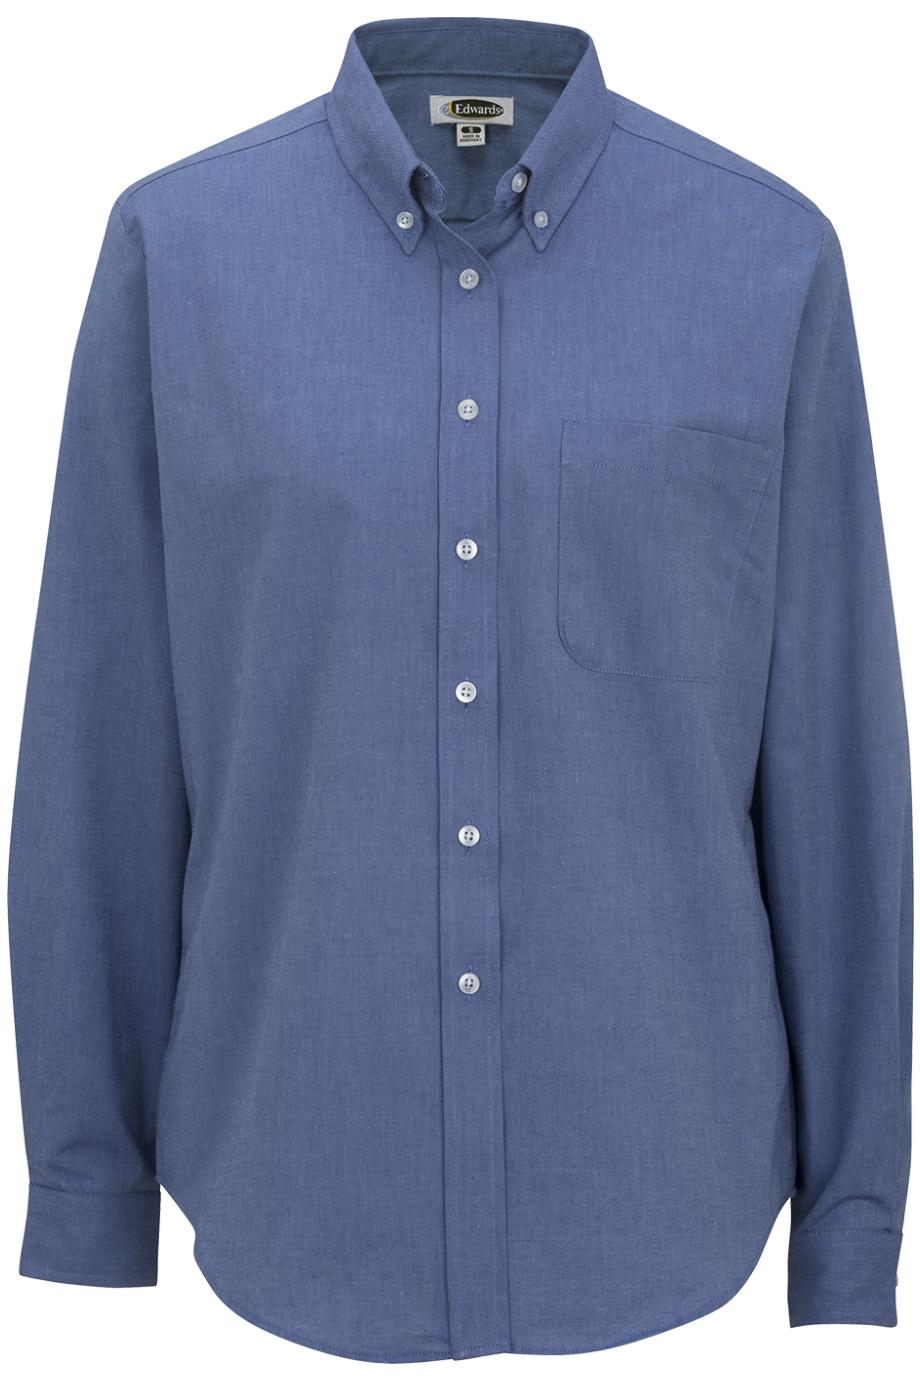 Ladies' Long Sleeve Oxford Shirt 5077